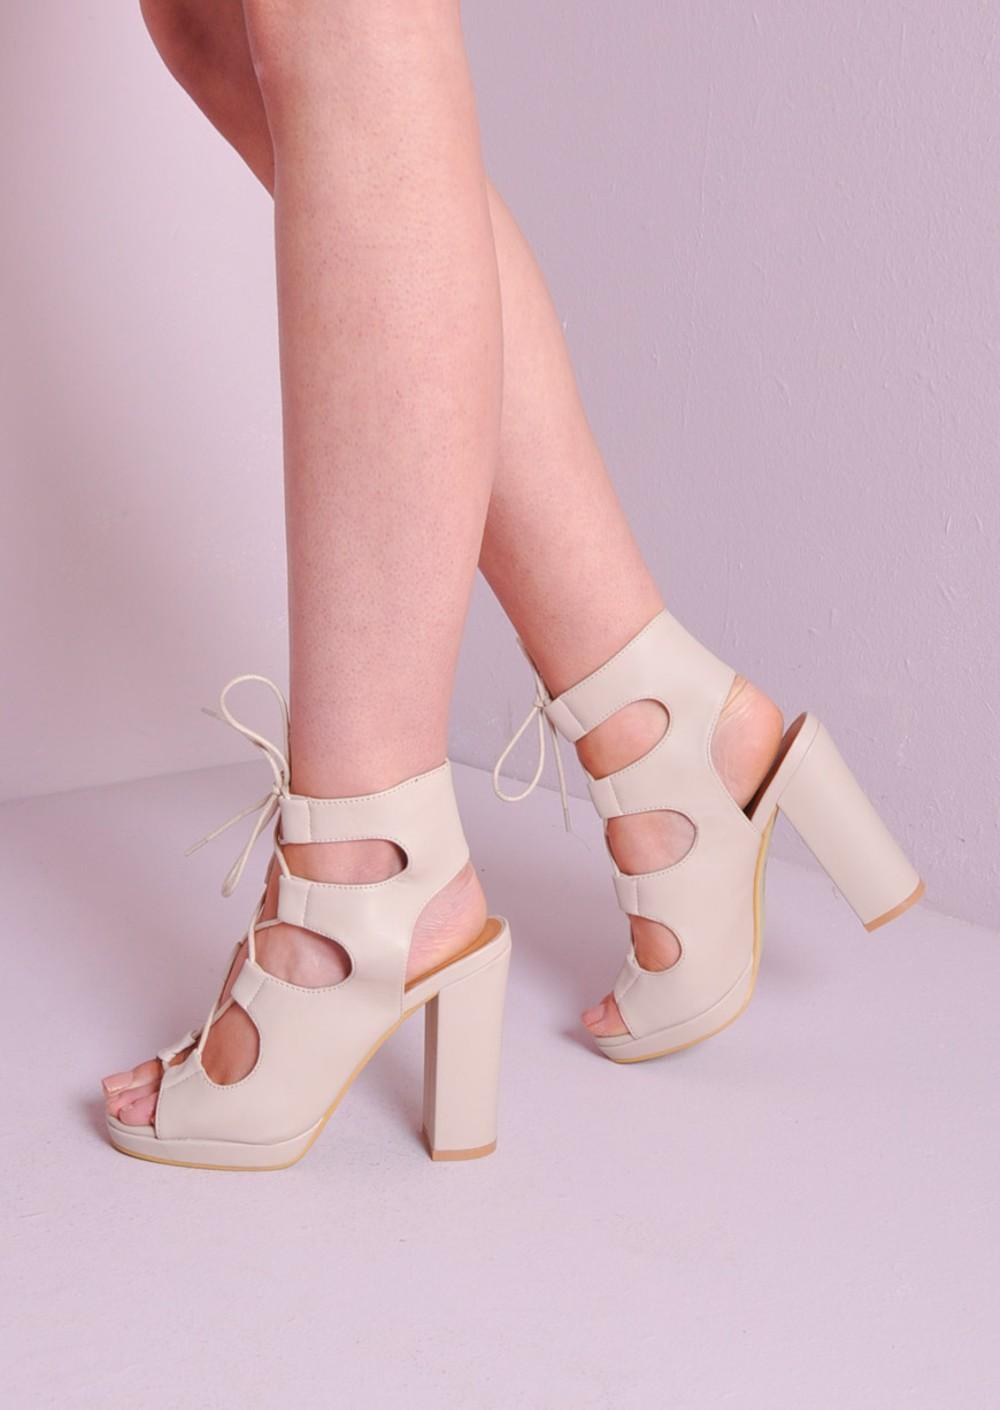 KIMANA SANDALS: Dolce Vita | Strappy sandals heels, Crazy